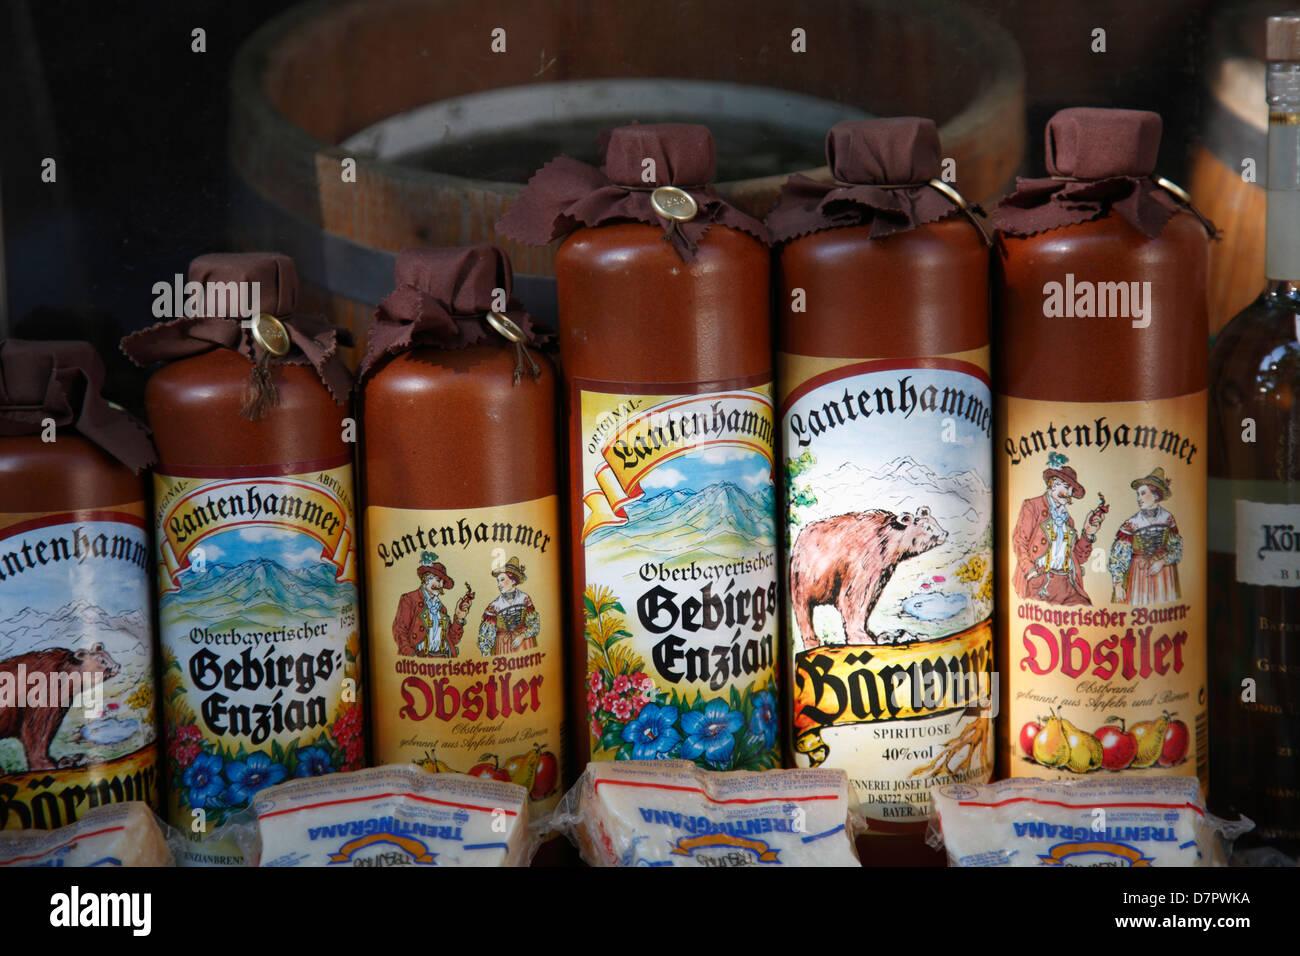 Traditional bavarian alkohol at Viktualienmarkt, market stall, Munich, Bavaria, Germany - Stock Image